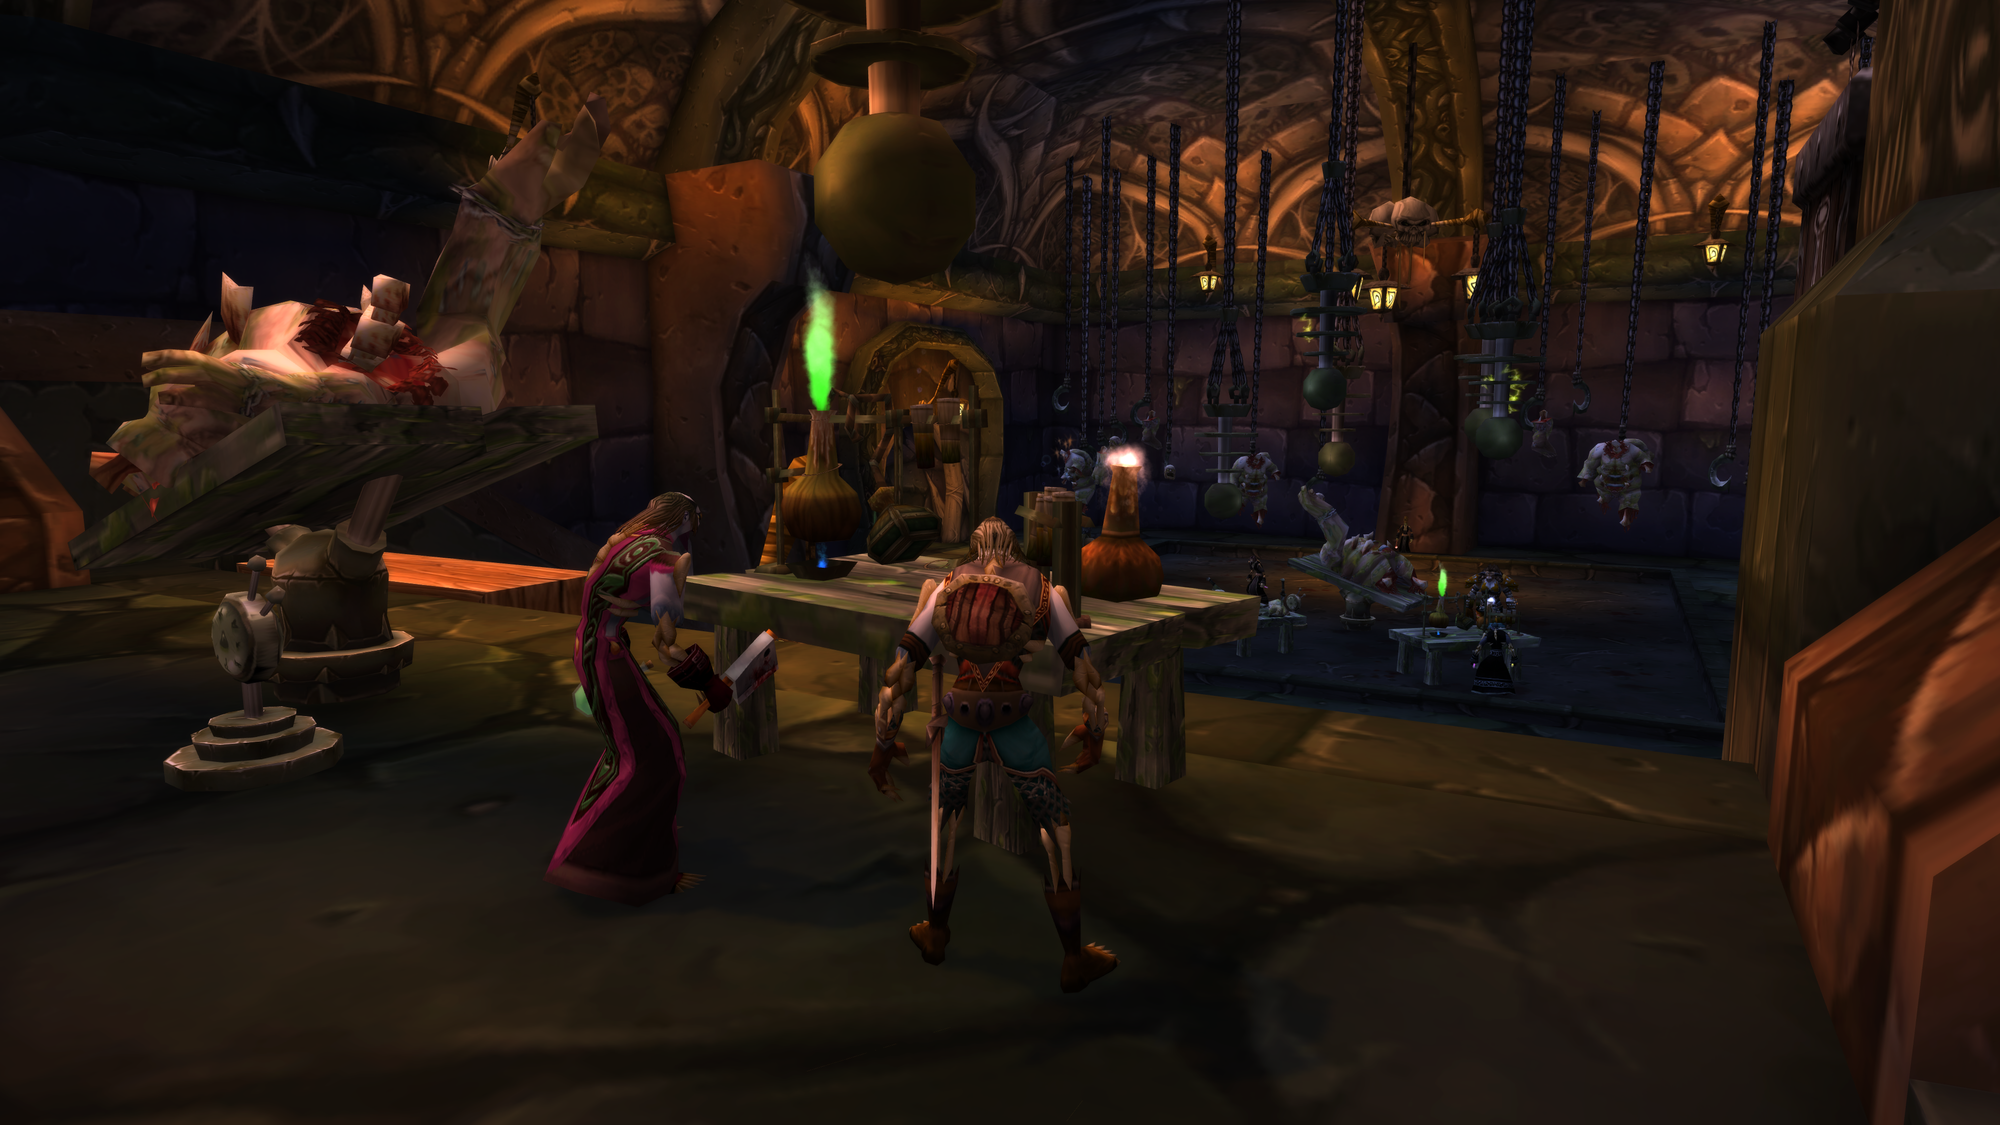 World Of Warcraft Screenshot 2019.05.23 - 19.16.11.77.png